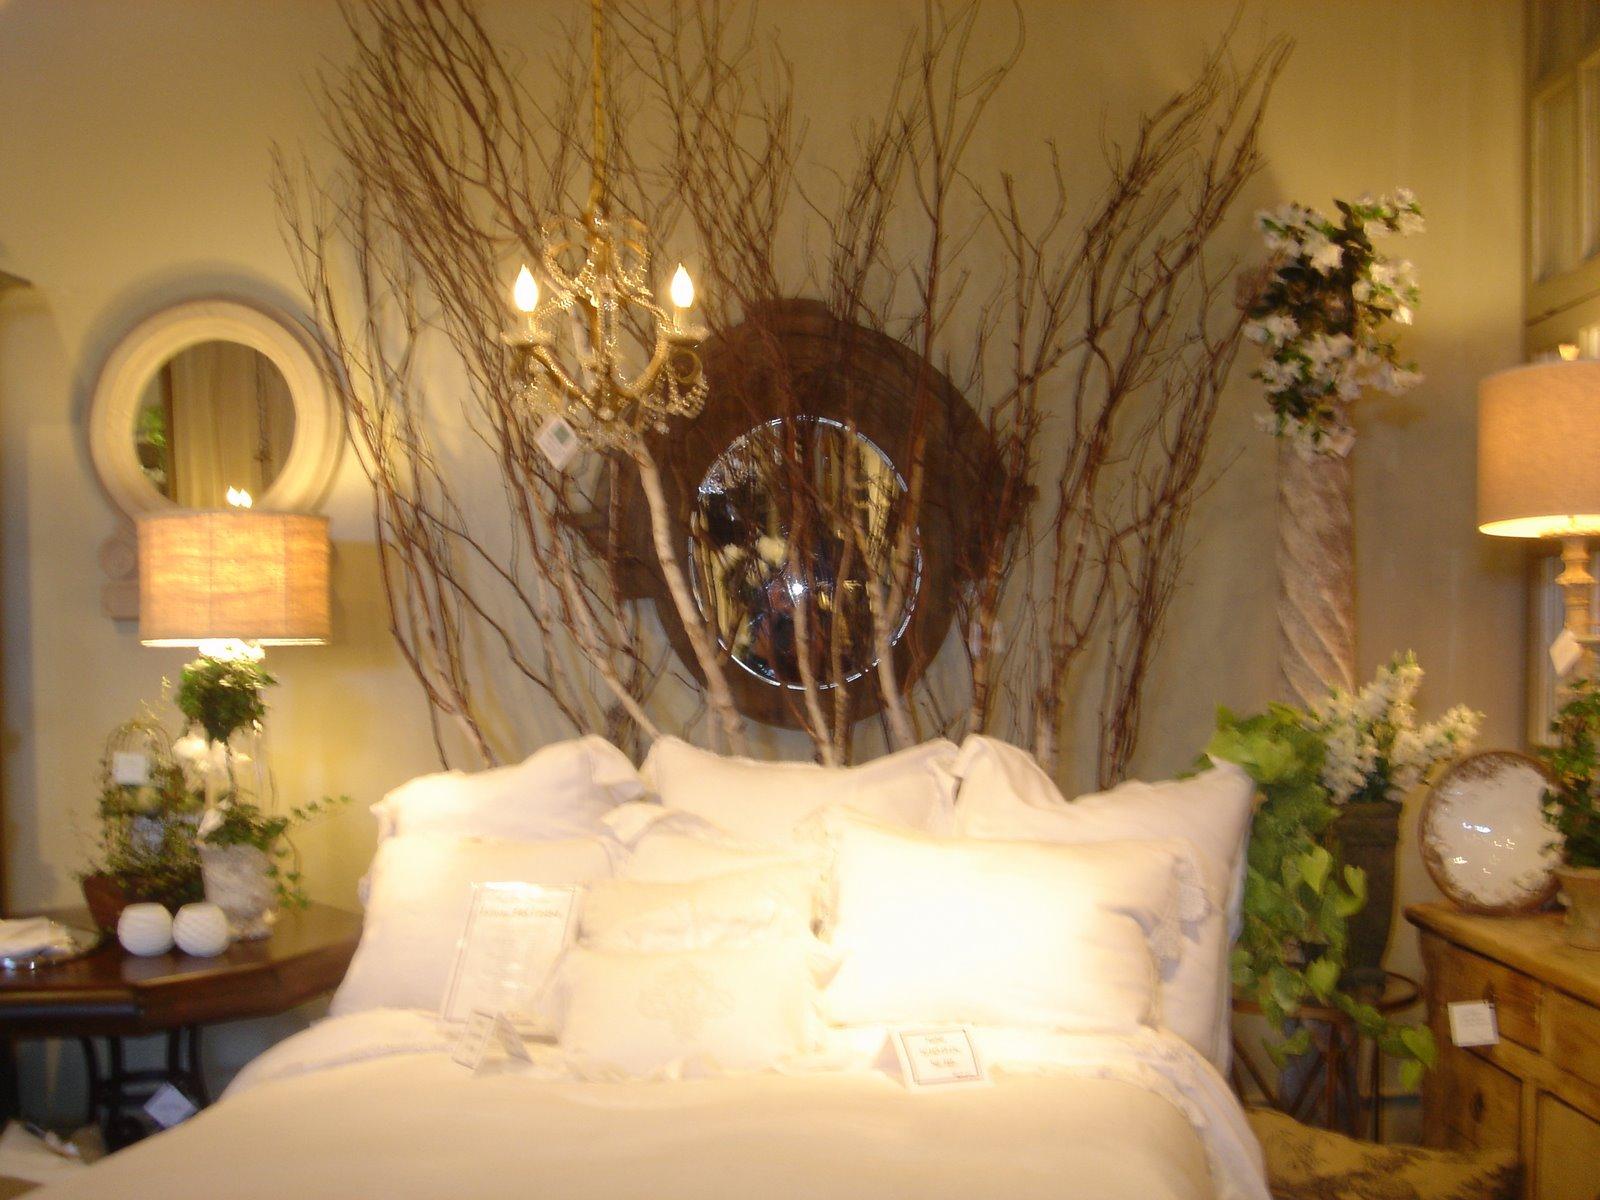 Boiserie Camera Da Letto Fai Da Te : Boiserie c testate da letto fai da te diy splendide idee di